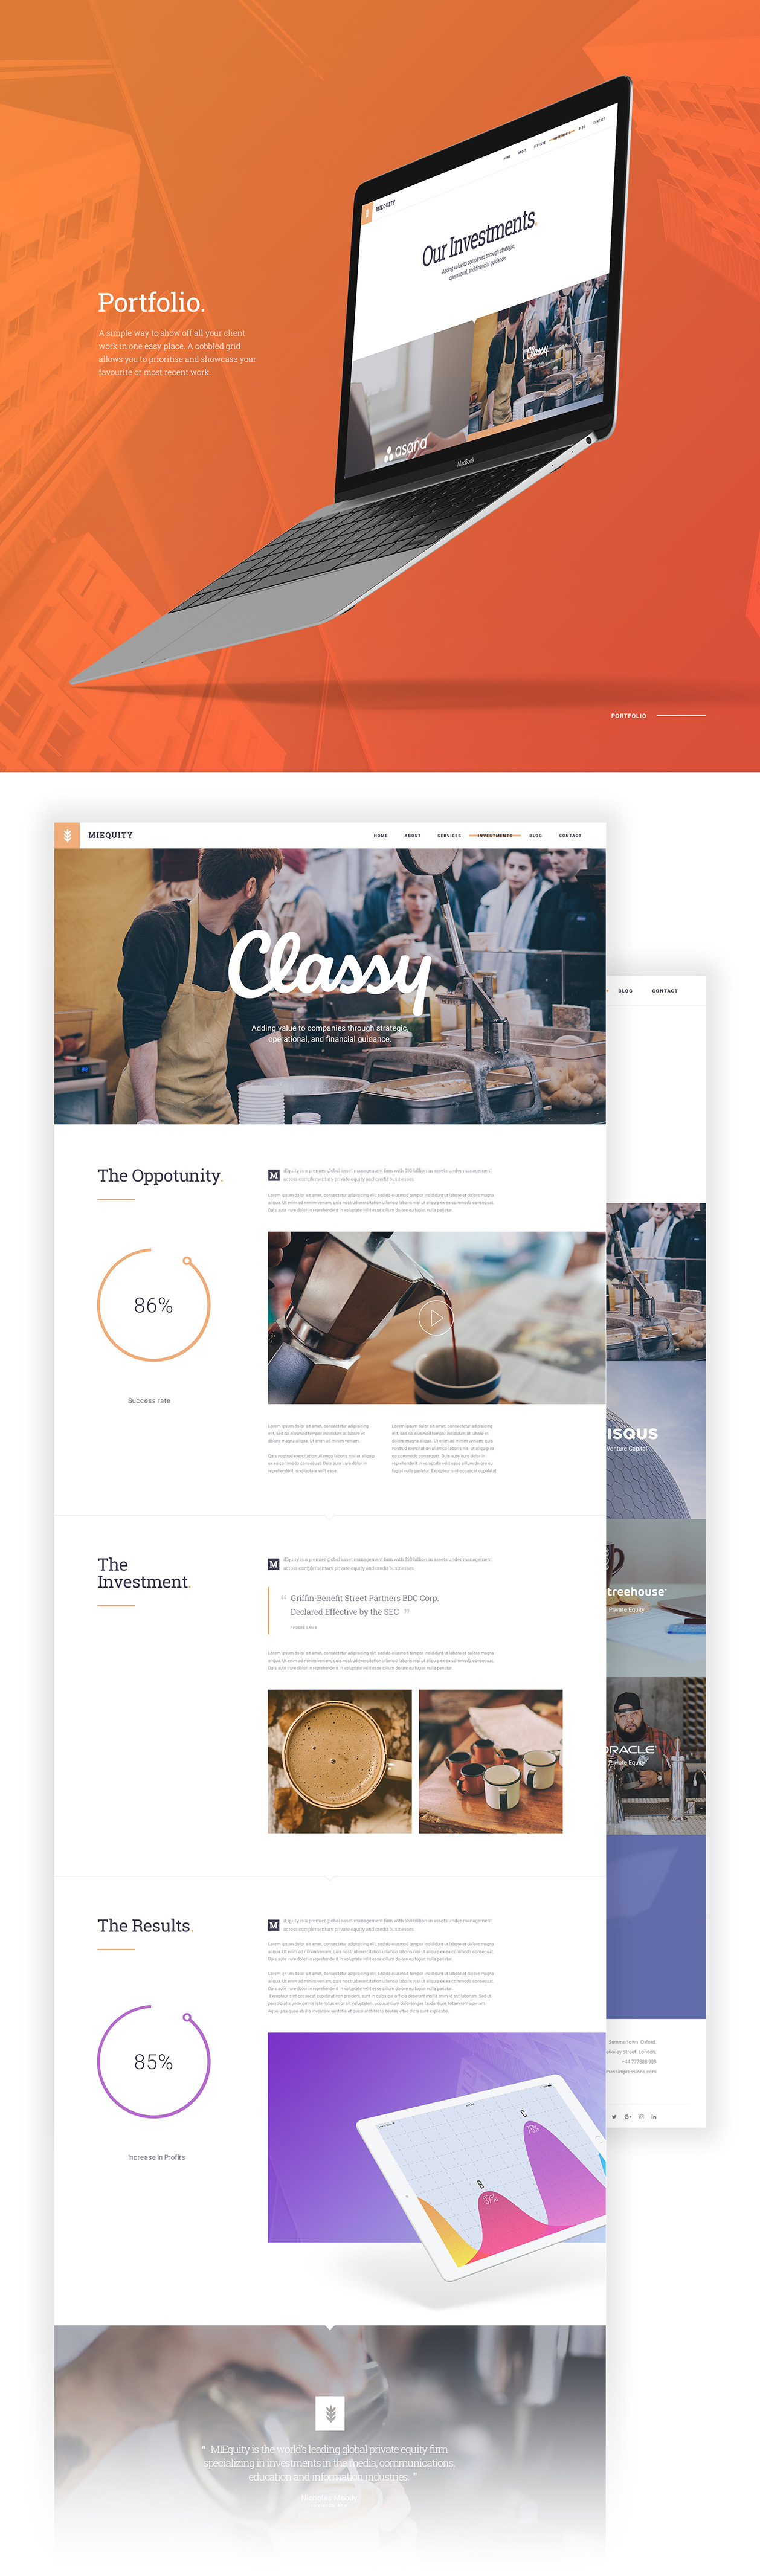 MIEQUITY Web Template Free PSD - Portfolio Page